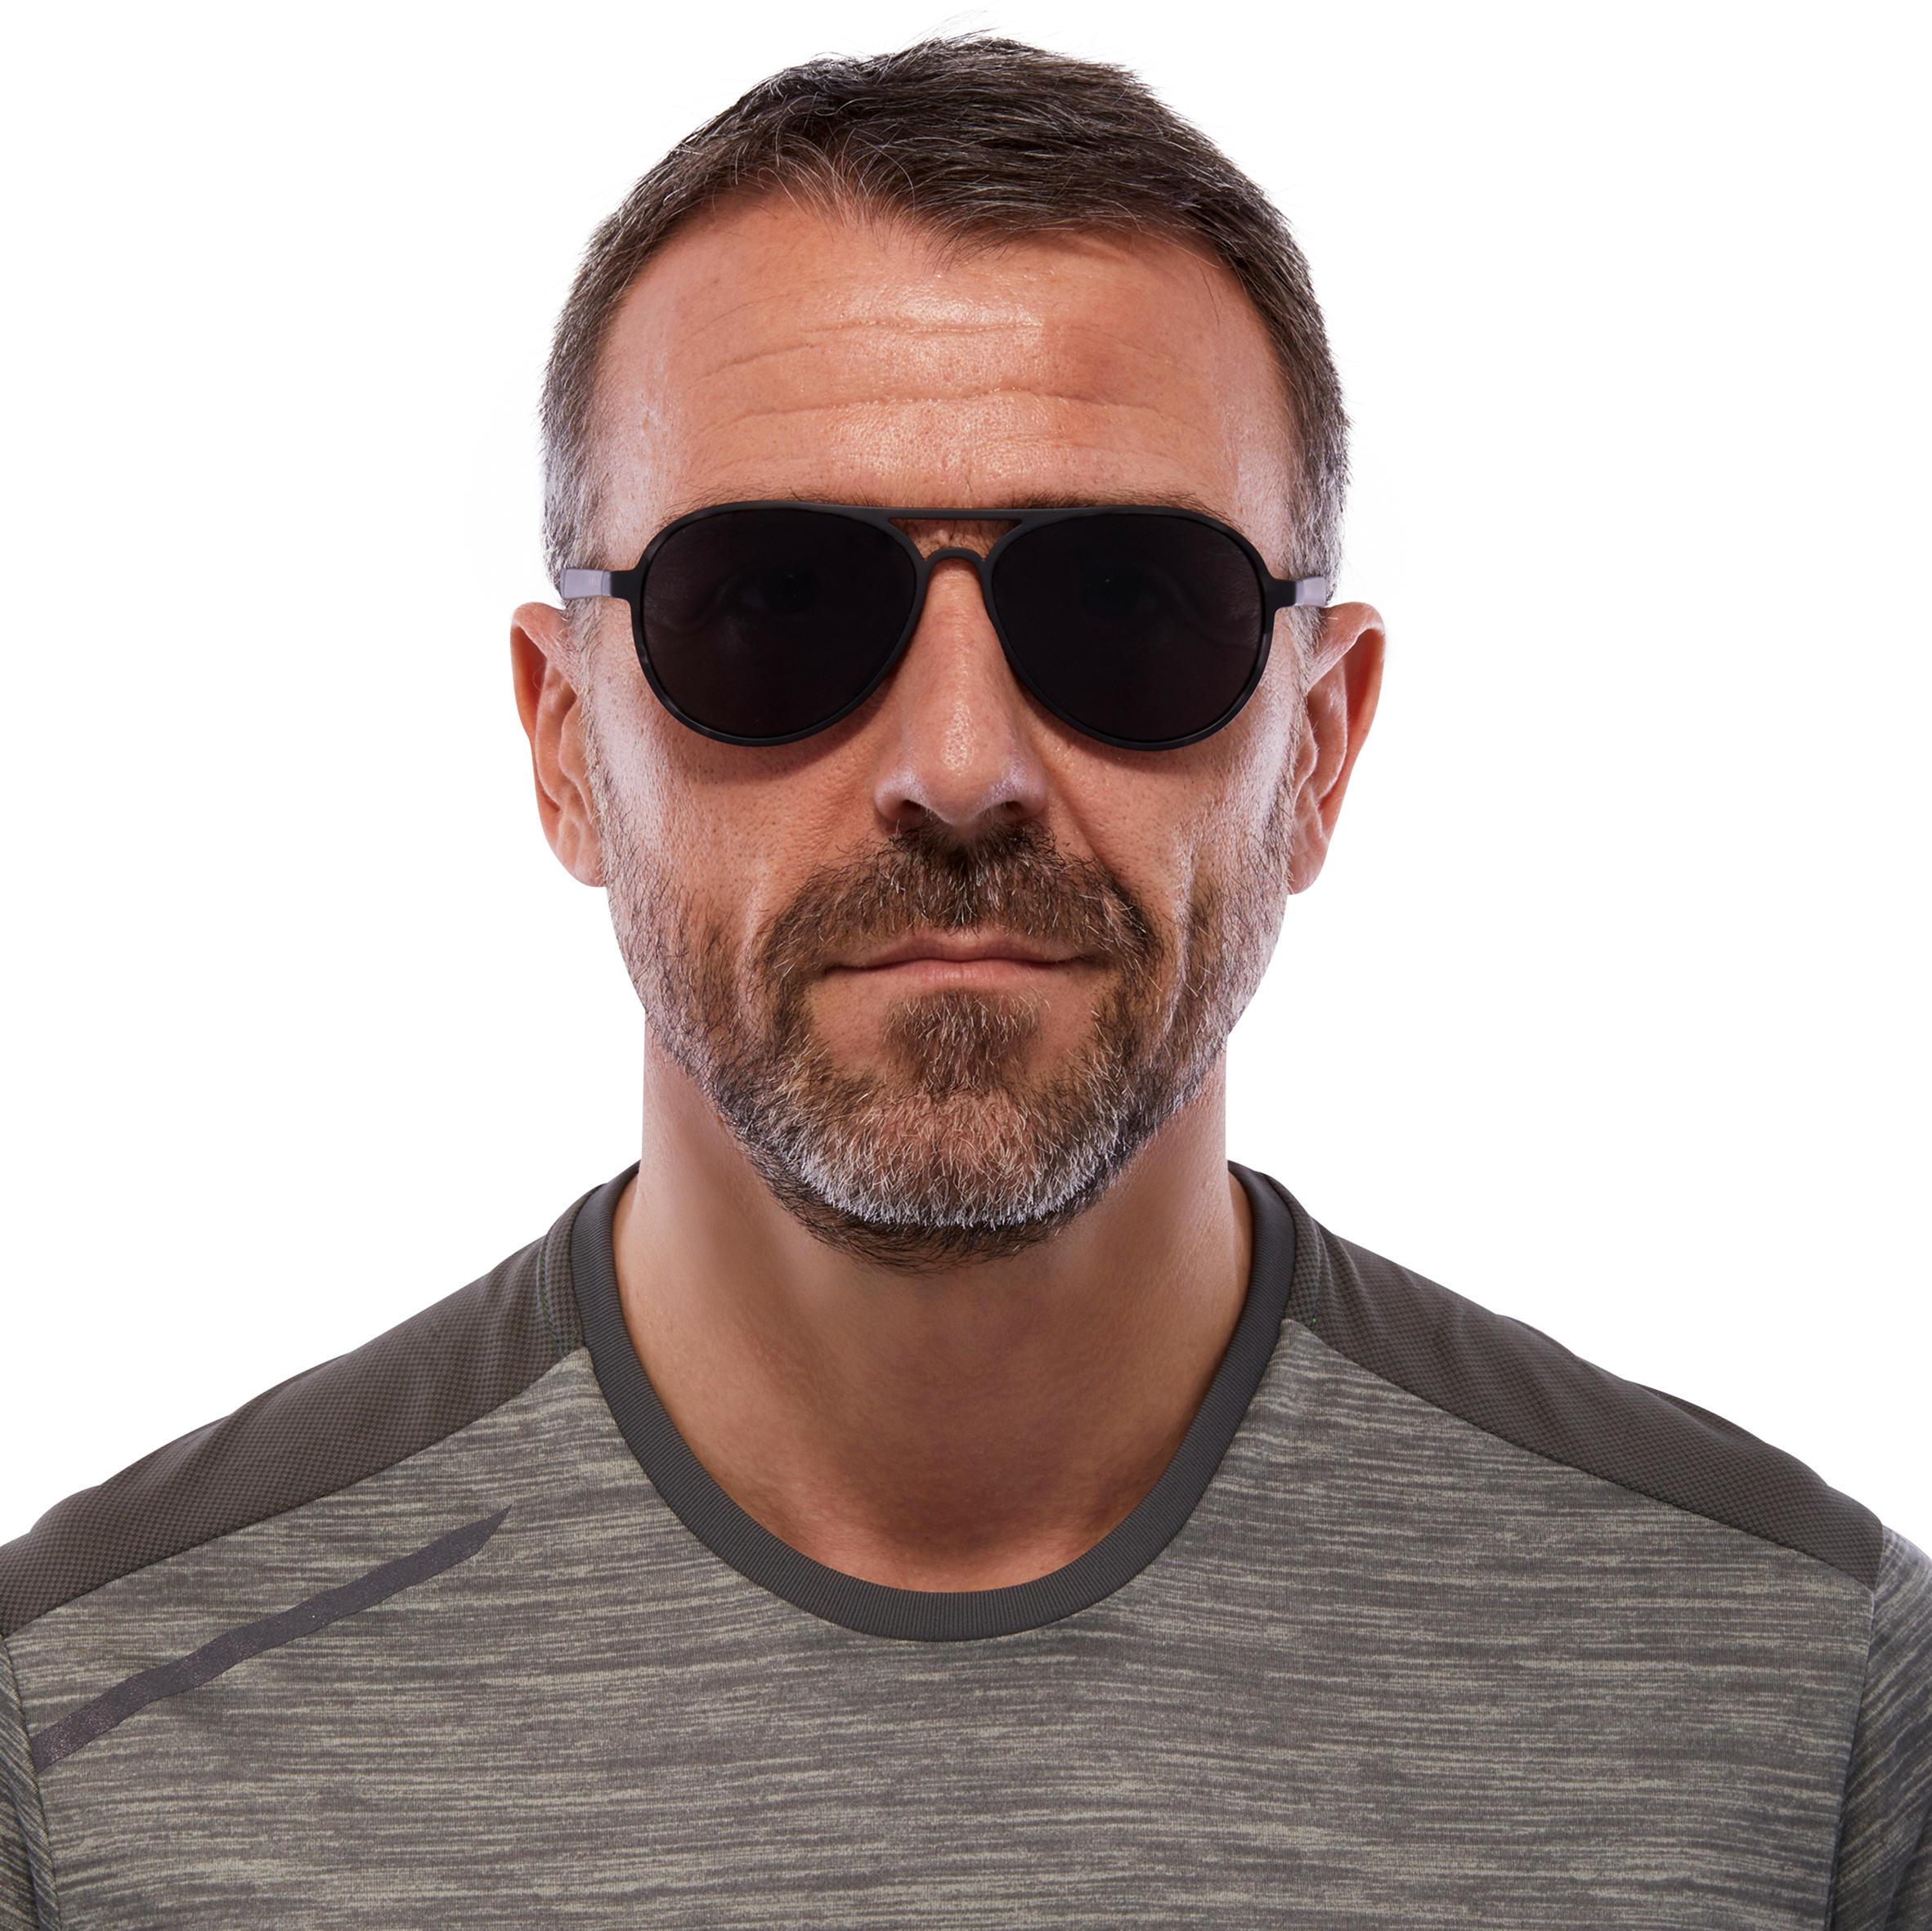 Hiking Sunglasses MH120A Category 3 - Grey/Black